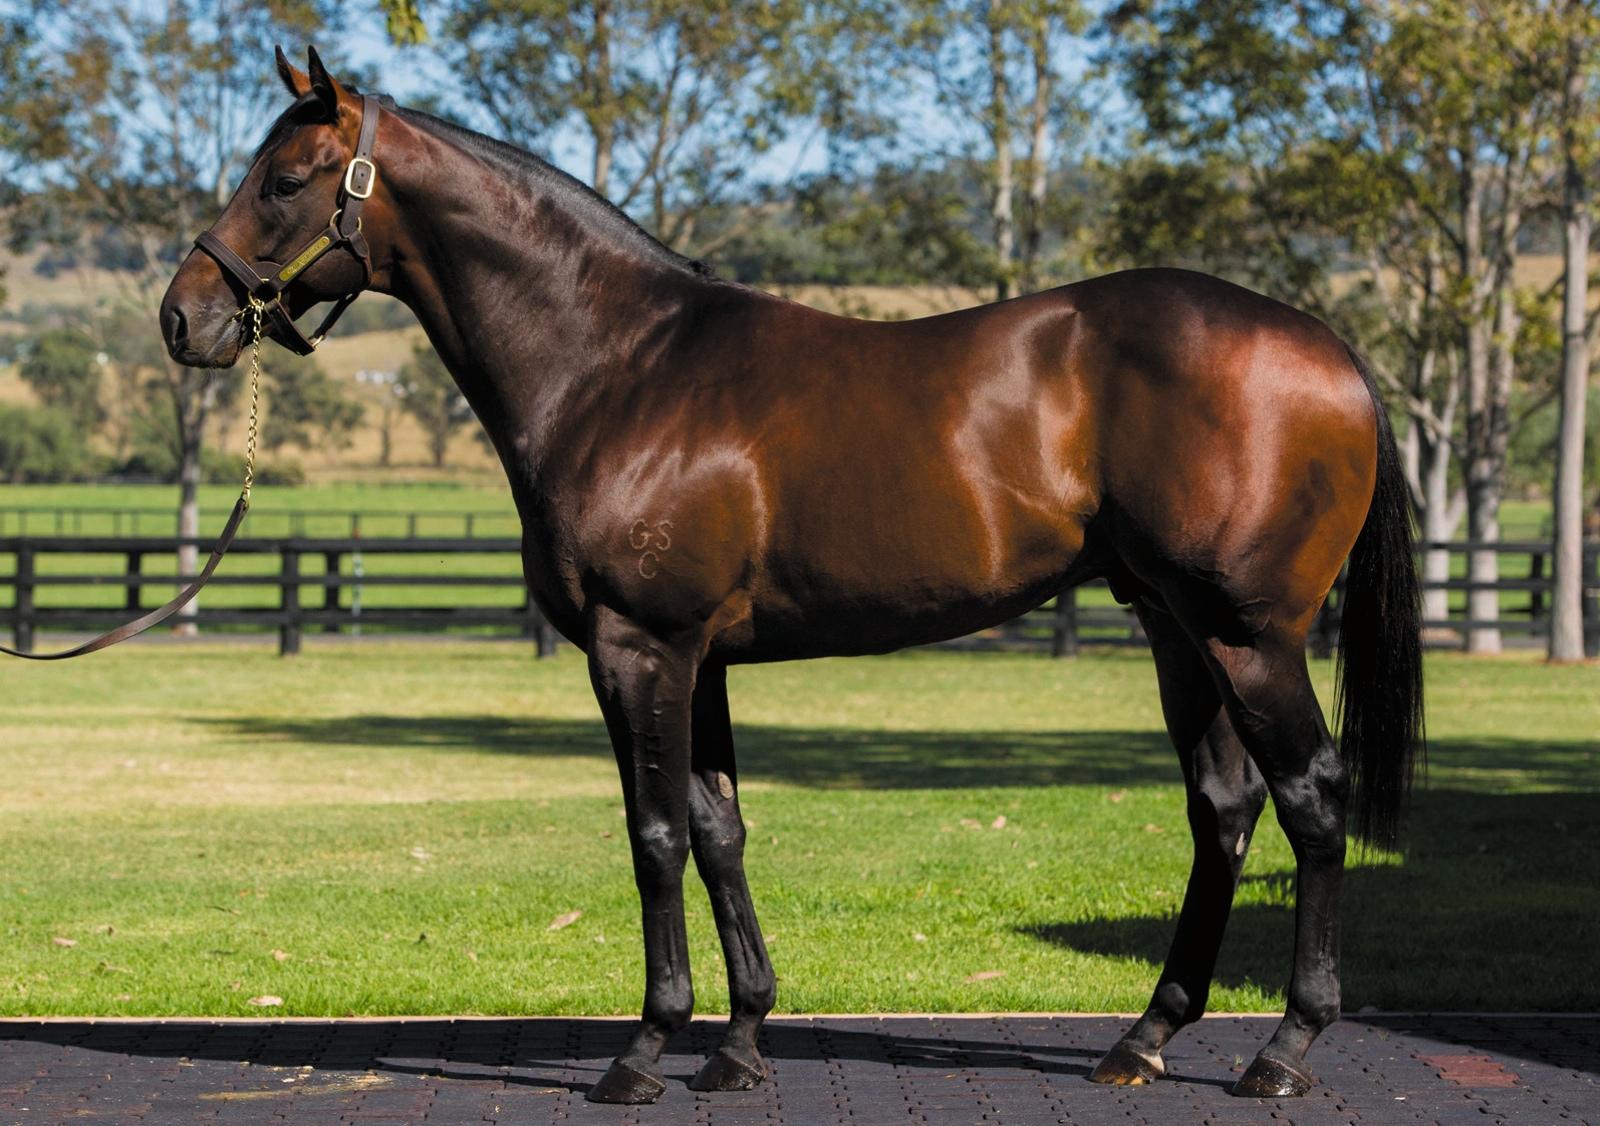 https://www.stallions.com.au/wp-content/uploads/2019/10/103675609.jpg